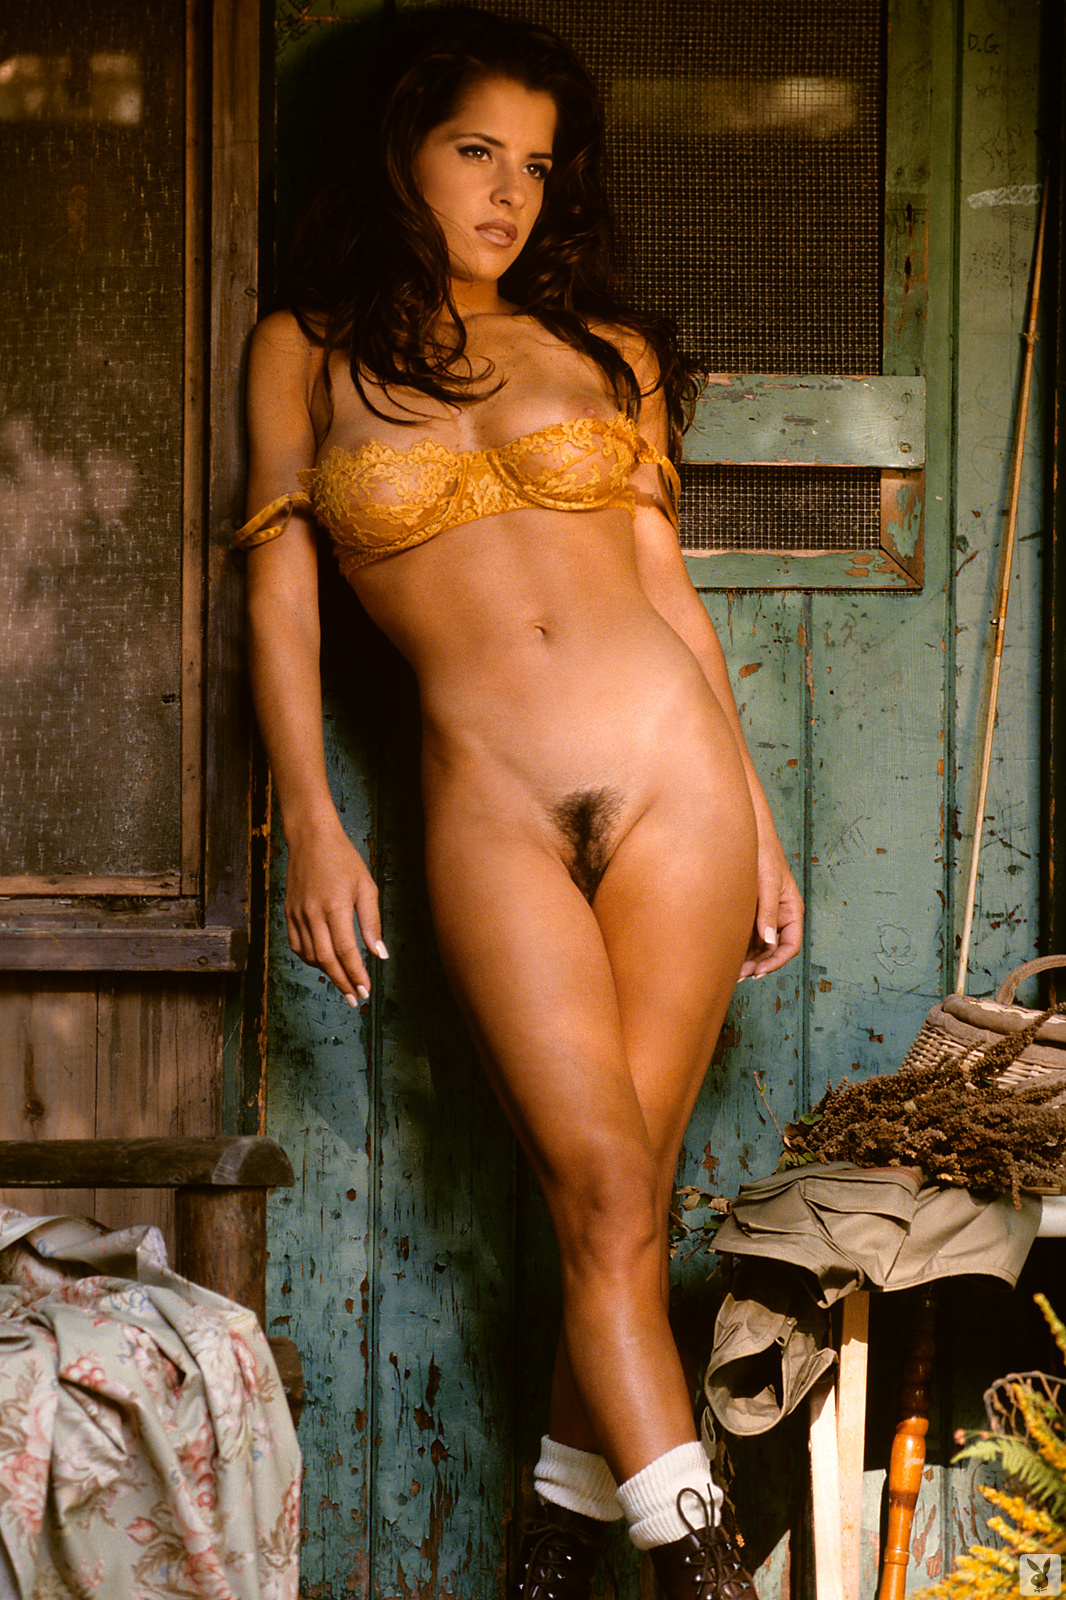 kelly-monaco-boobs-naked-playmate-april-1997-playboy-13